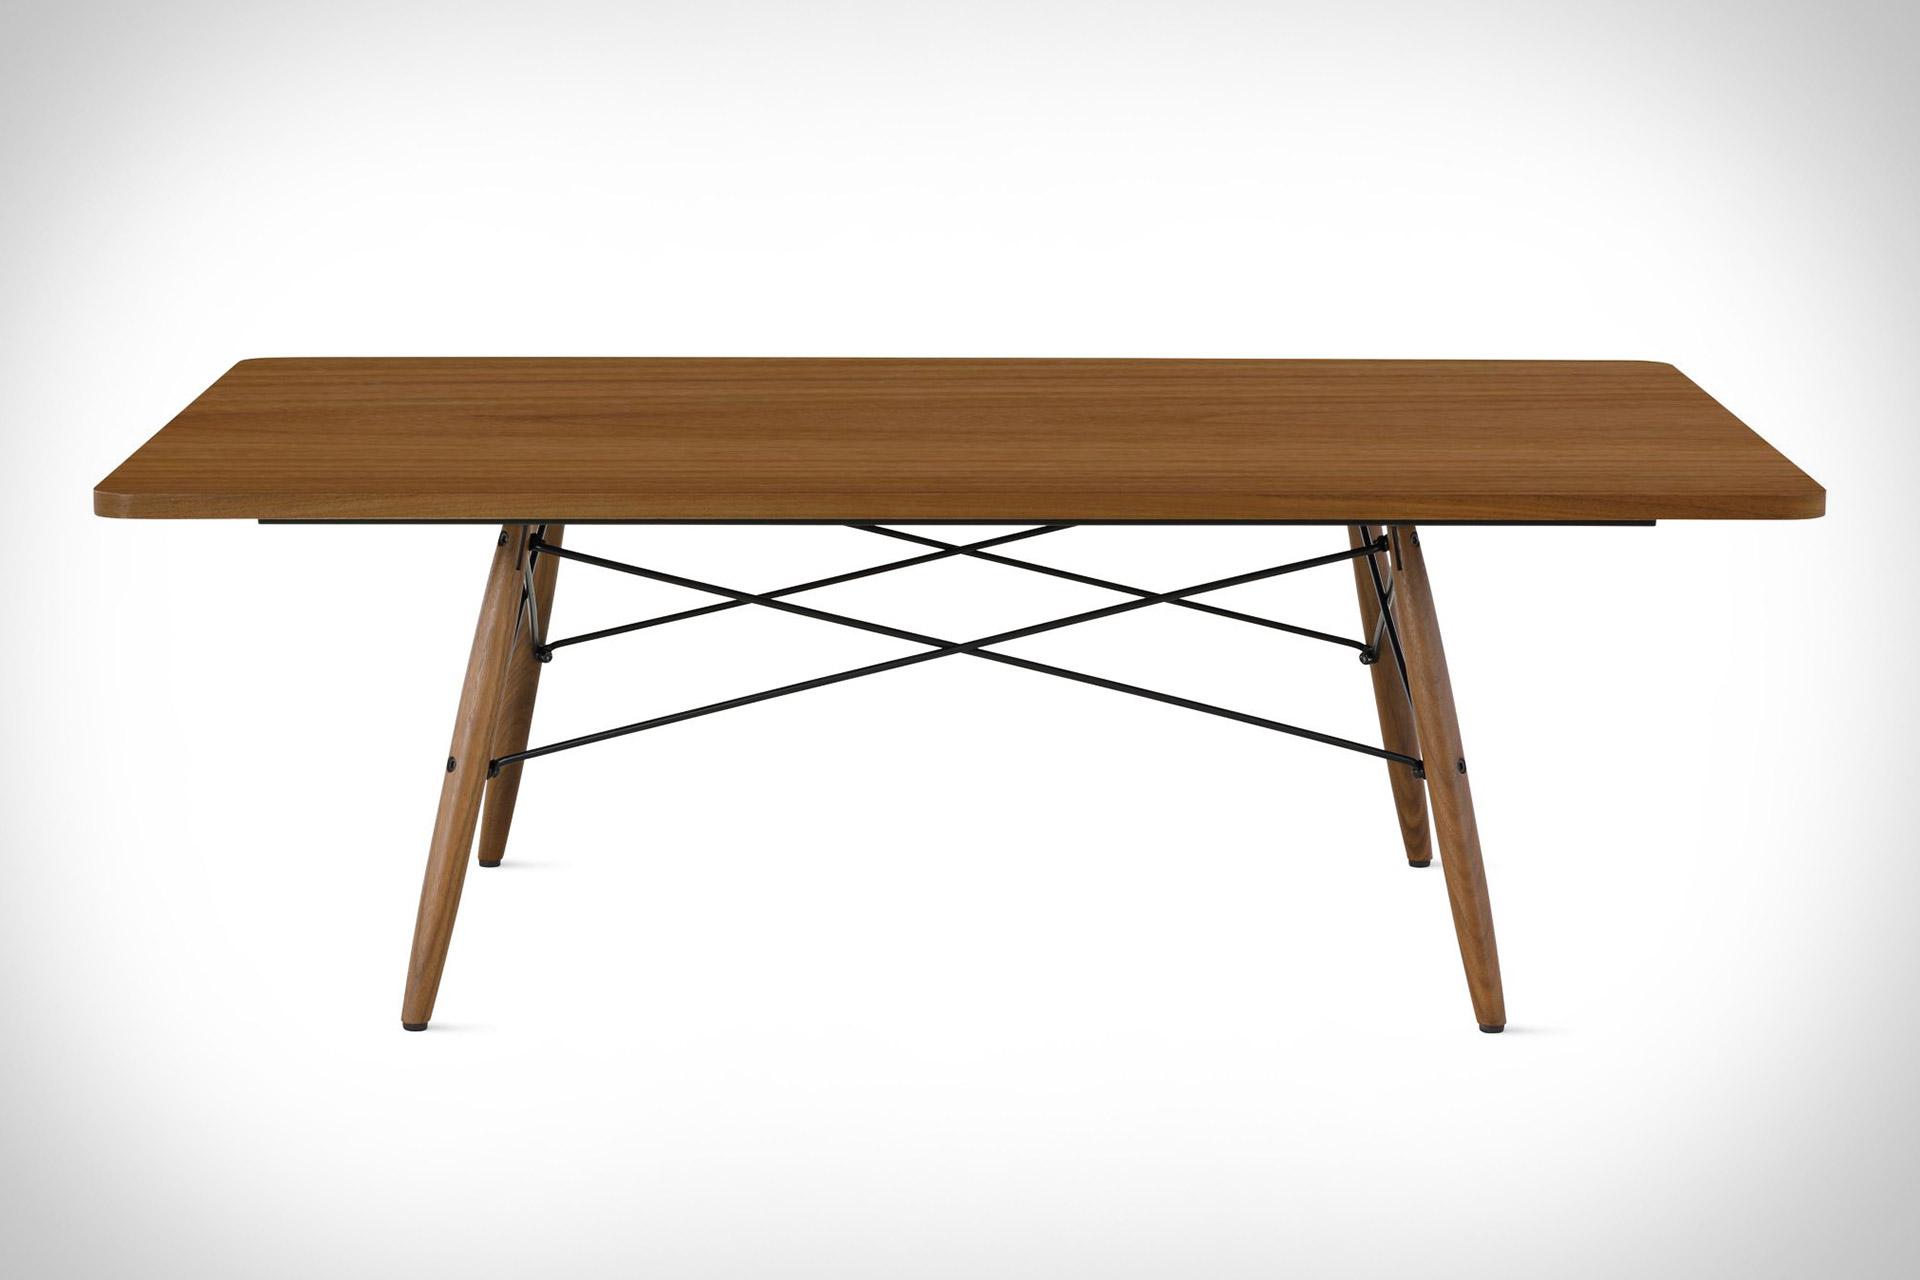 elegant table basse eames id es de conception de table basse. Black Bedroom Furniture Sets. Home Design Ideas